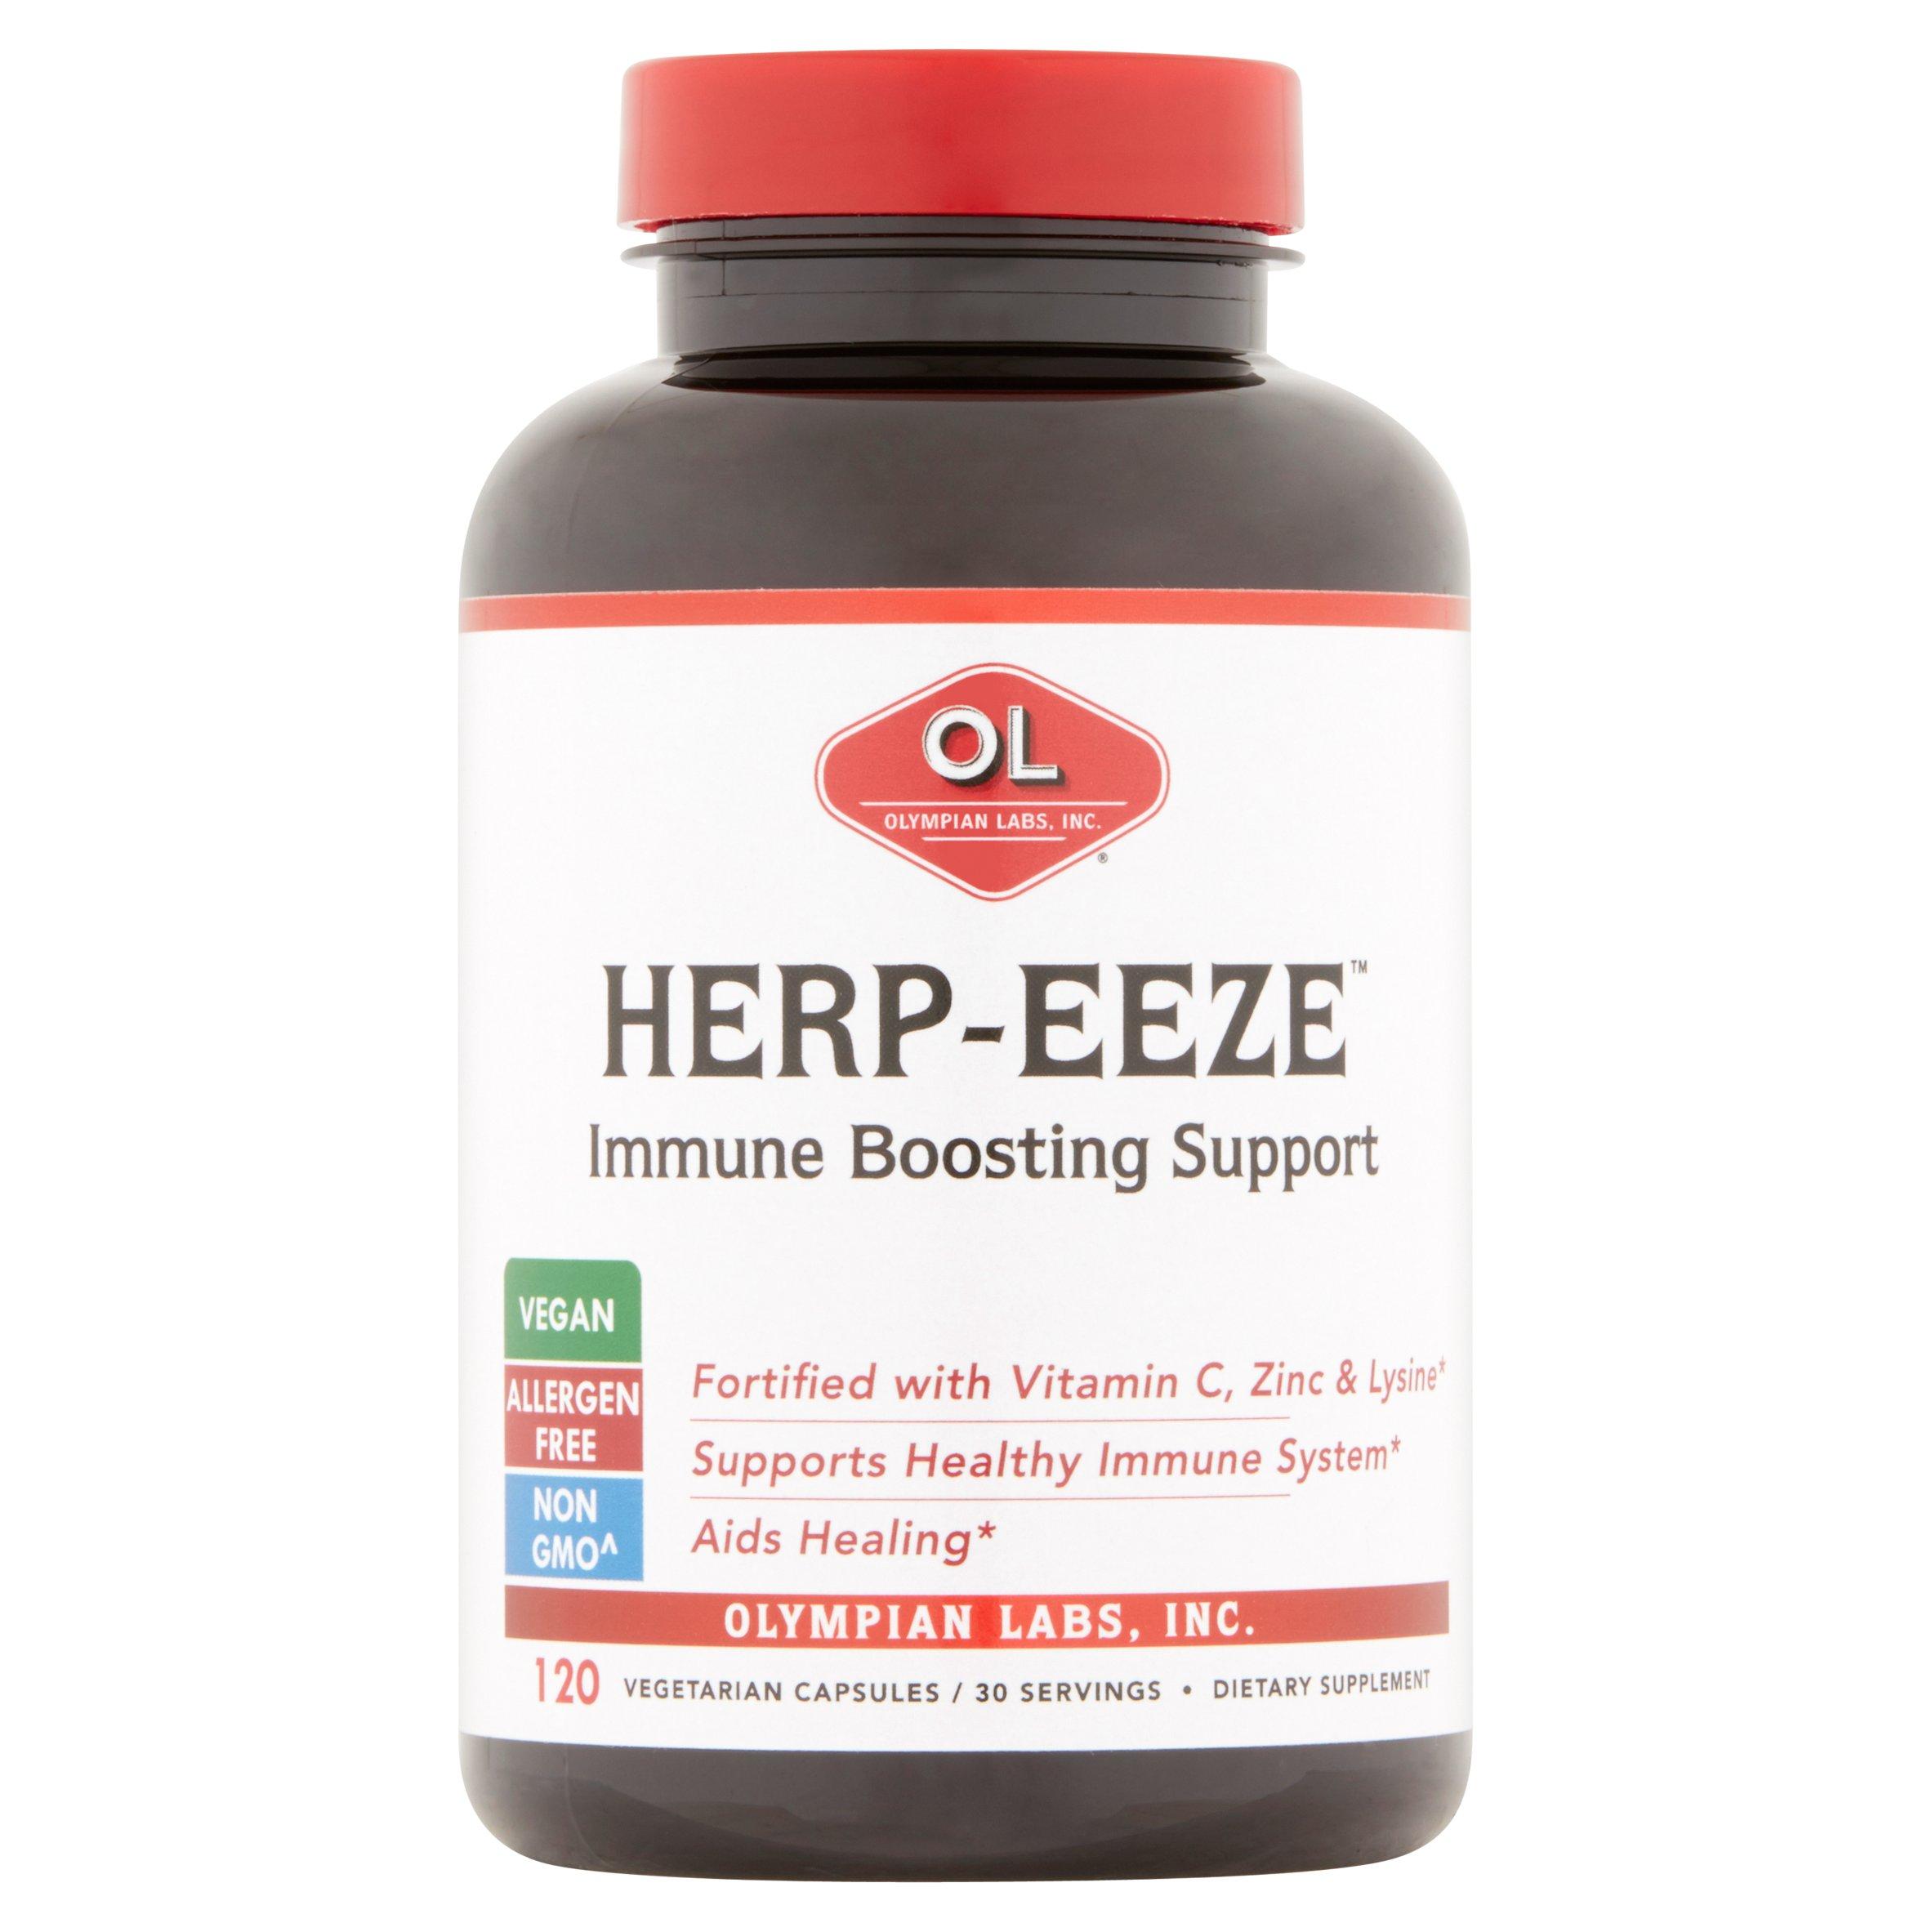 Olympian Labs Herp-Eeze Immune Boosting Support Vegetarian Capsules, 120 count